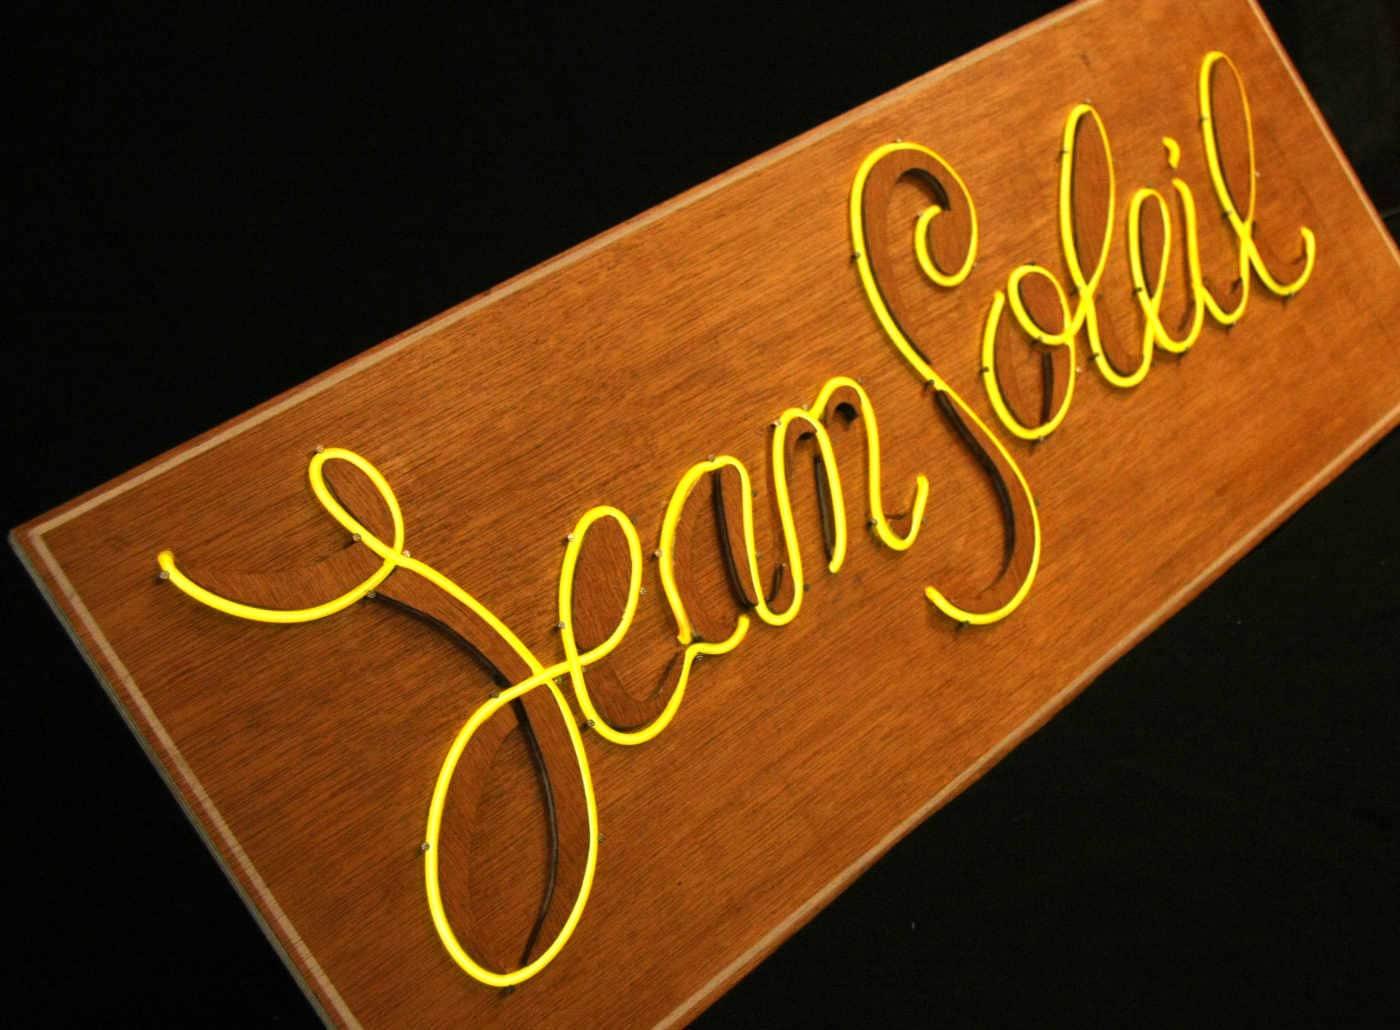 Jean-Soleil